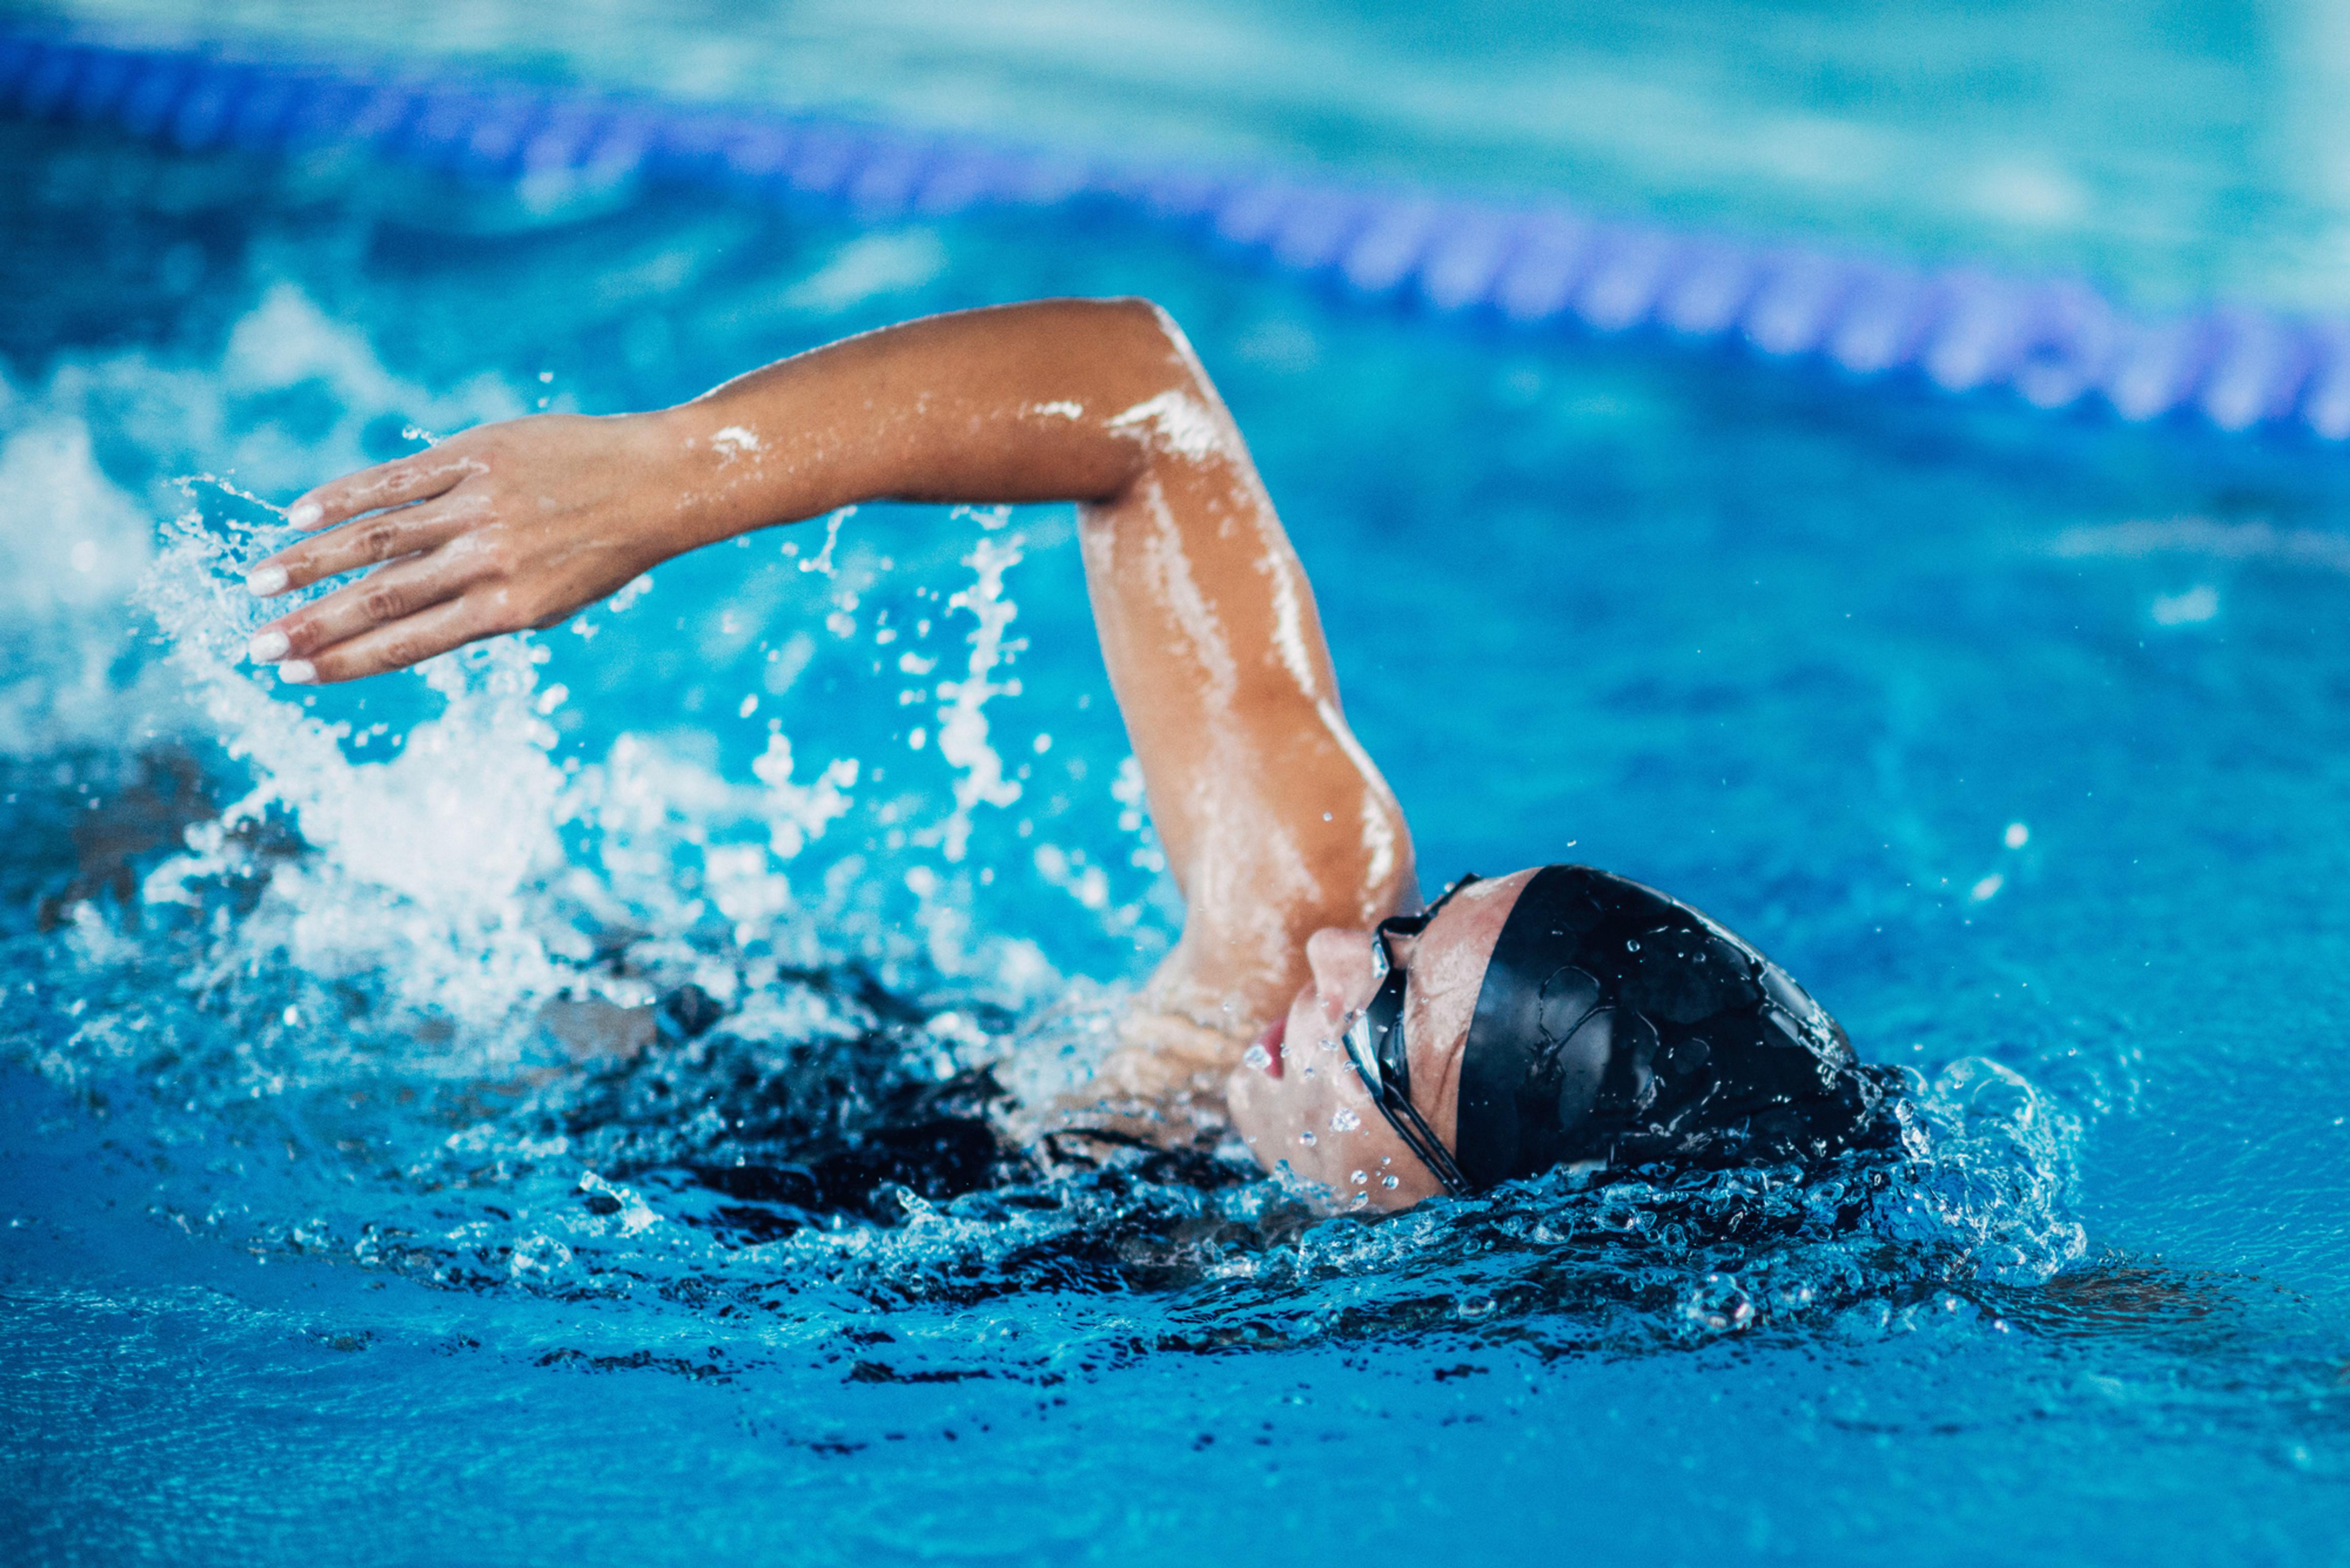 Lane swimming sessions